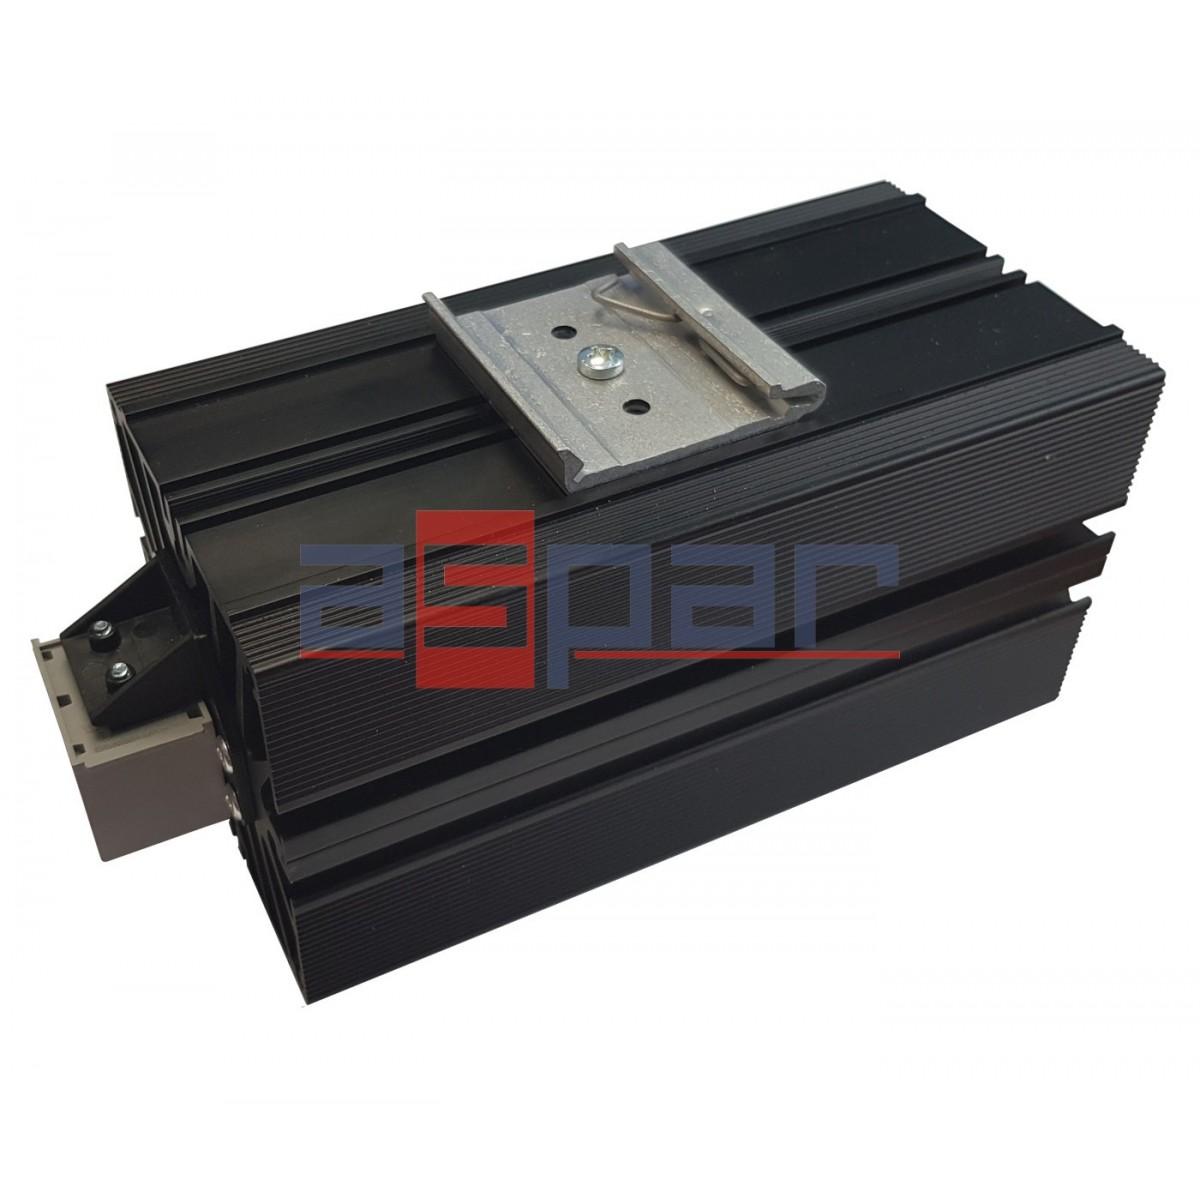 SH150 110-240V AC/DC - grzałka, 150W